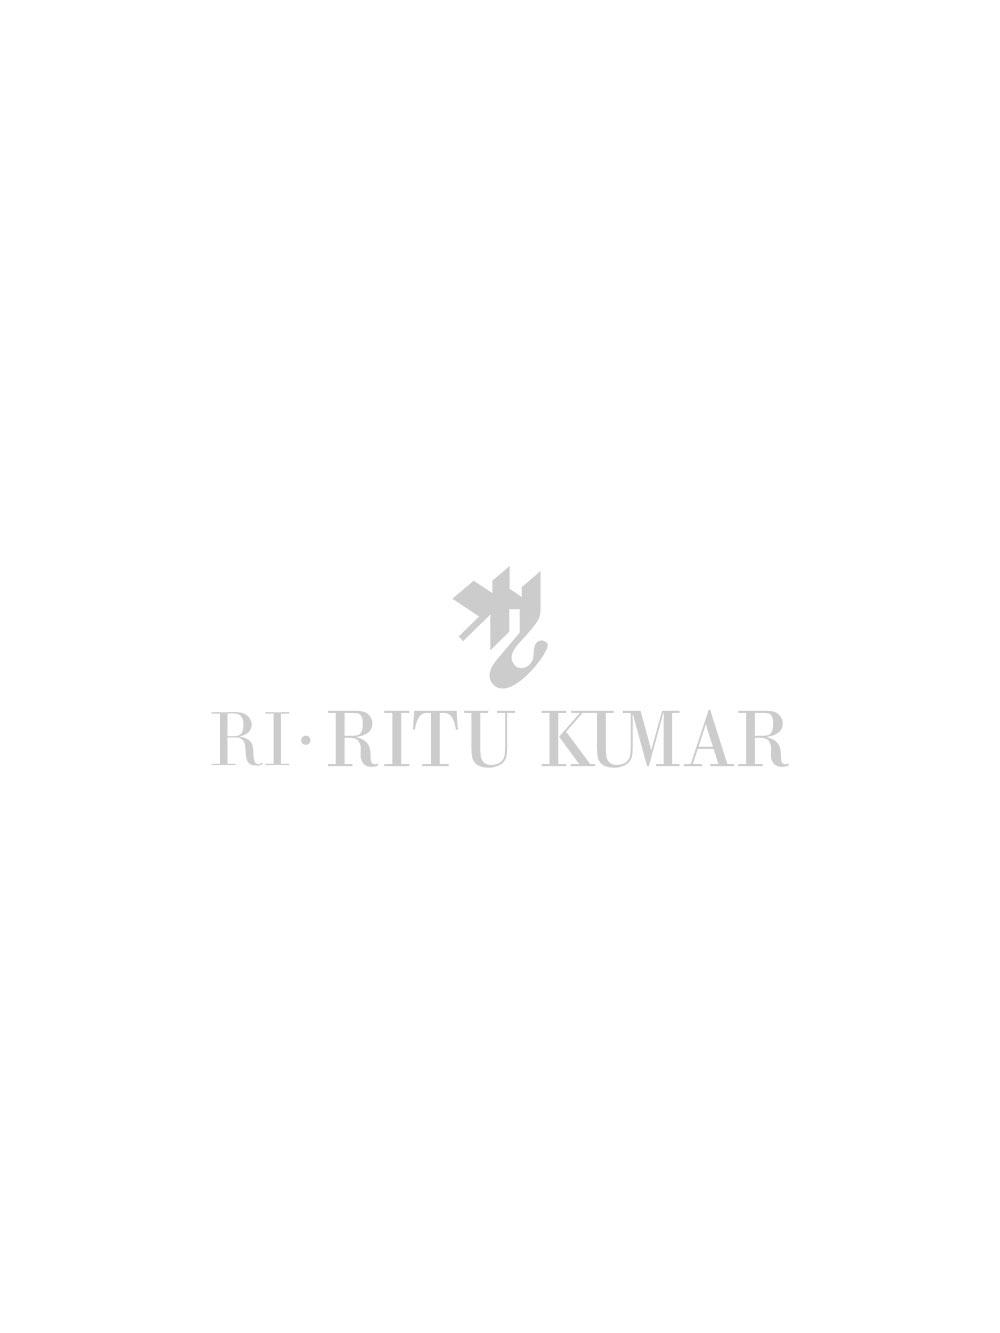 Kalki Koechlin's Fuchsia Woven Banarasi Saree With Unstitched Blouse